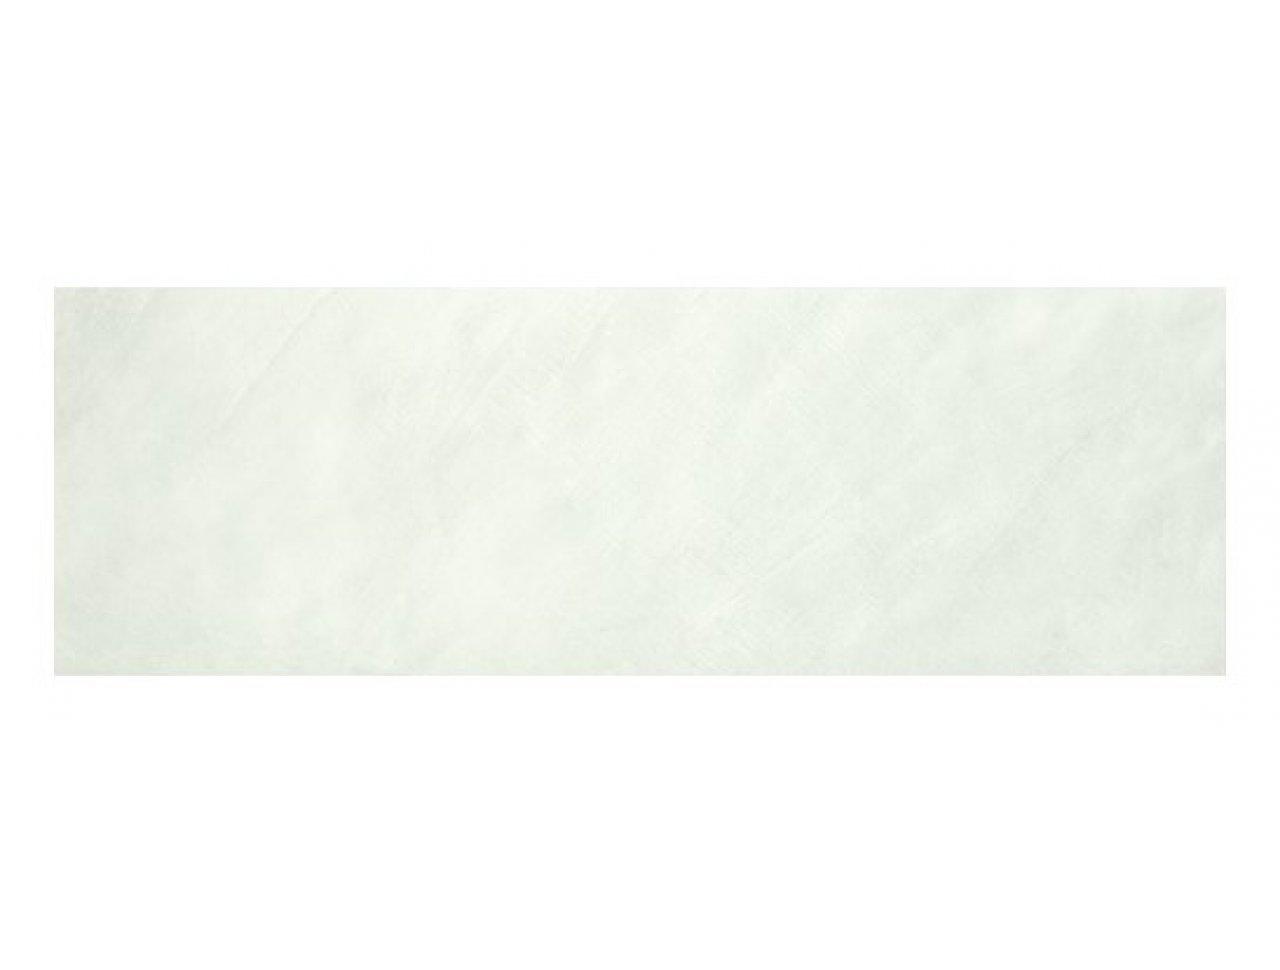 Настенная плитка FAP Color Now Ghiaccio 30.5x91.5 см, Арт. fMRS